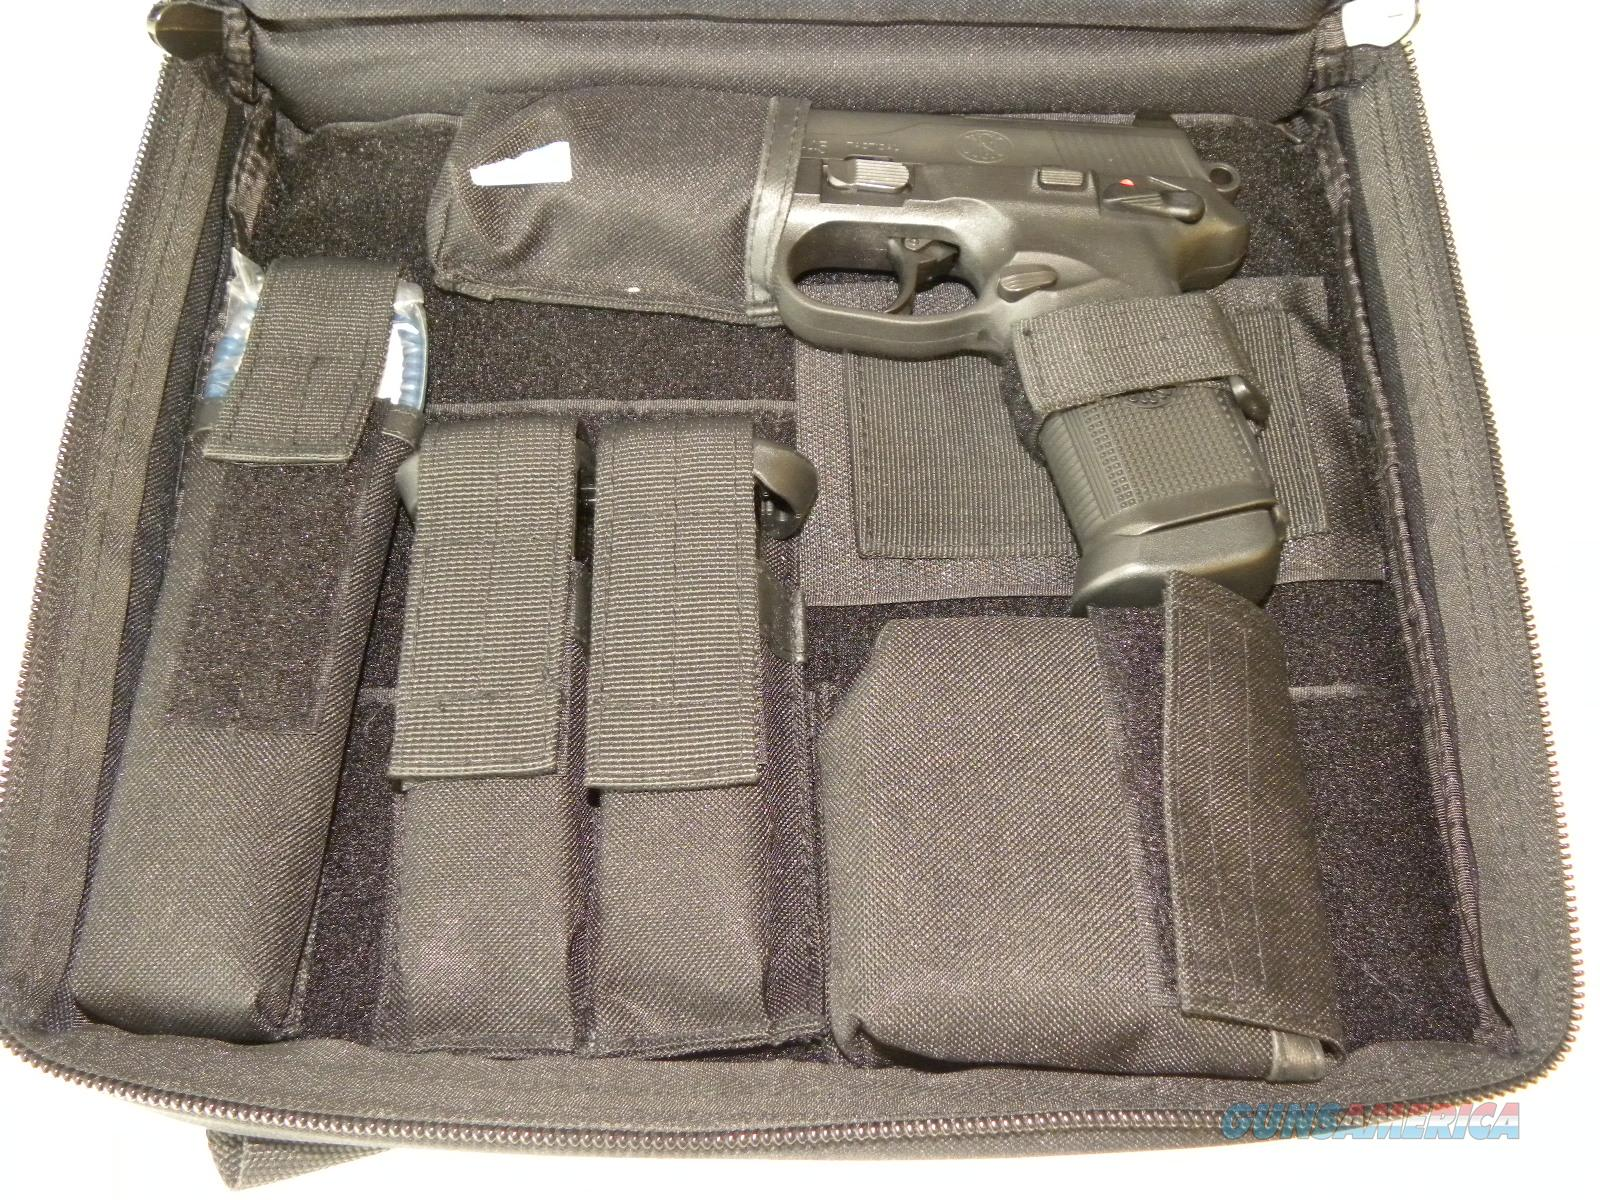 FN FNX Tactical .45 ACP  Guns > Pistols > FNH - Fabrique Nationale (FN) Pistols > FNX